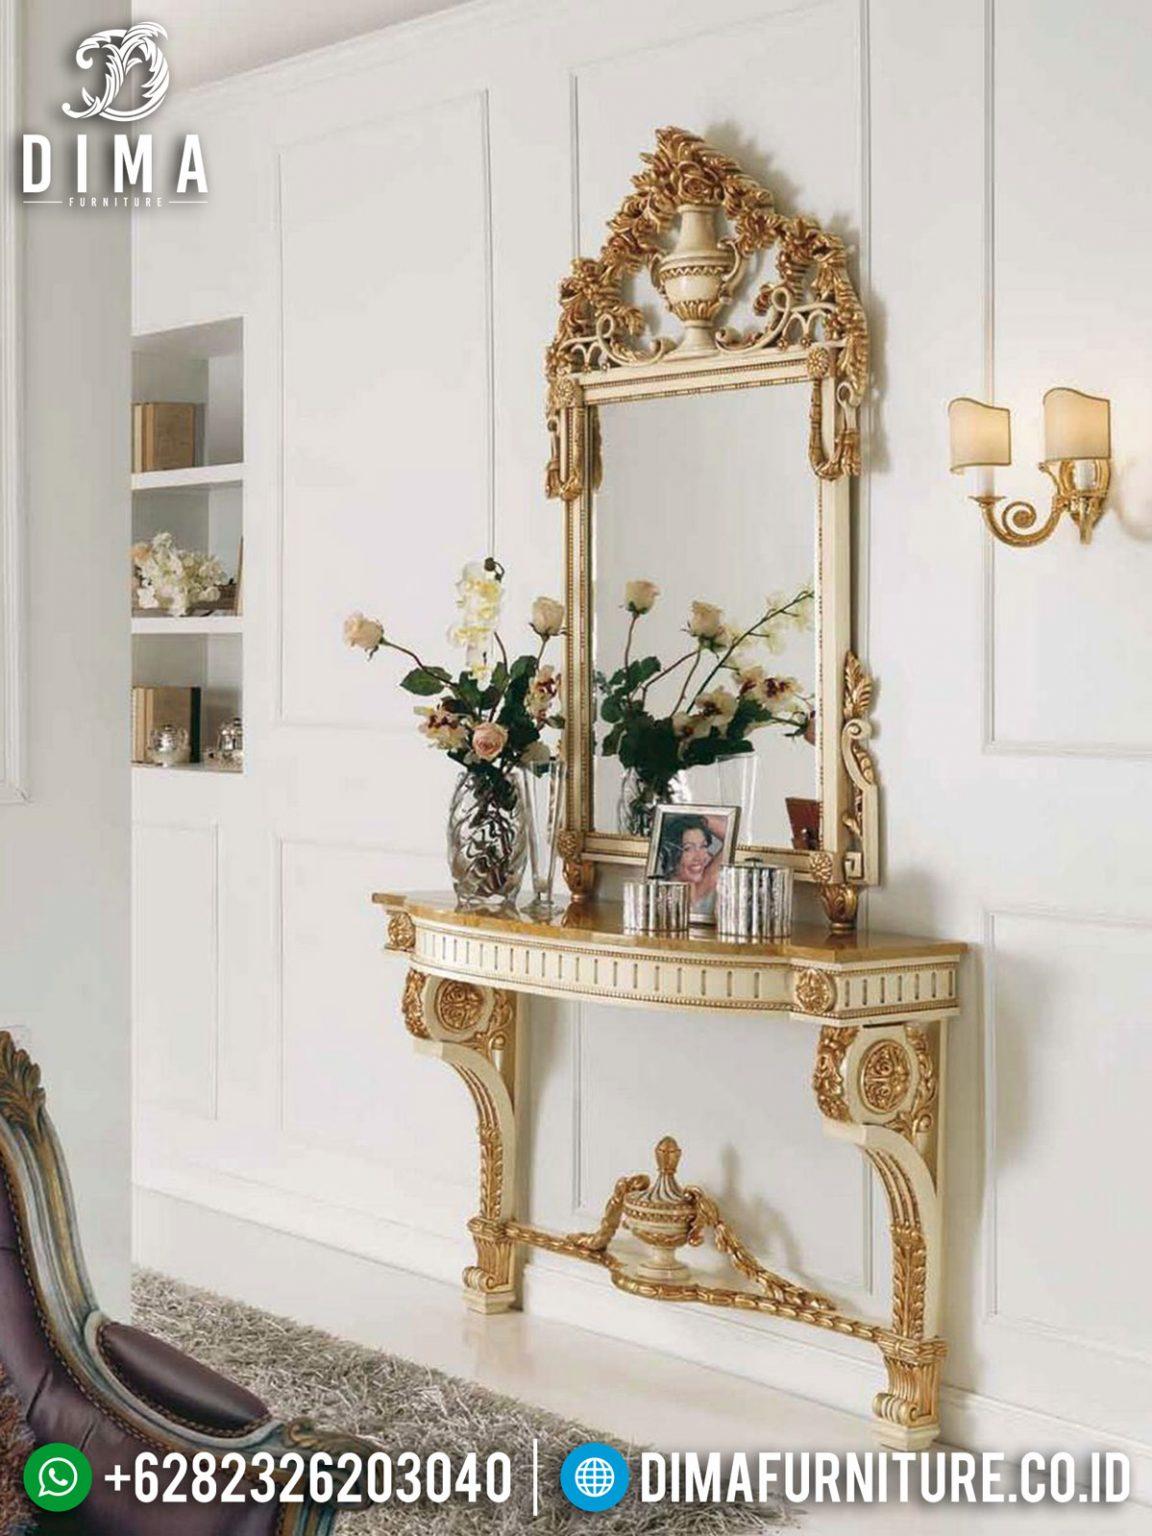 New Update Meja Konsol Mewah Ukiran Jepara Luxury Classic Solid Wood ST-0967